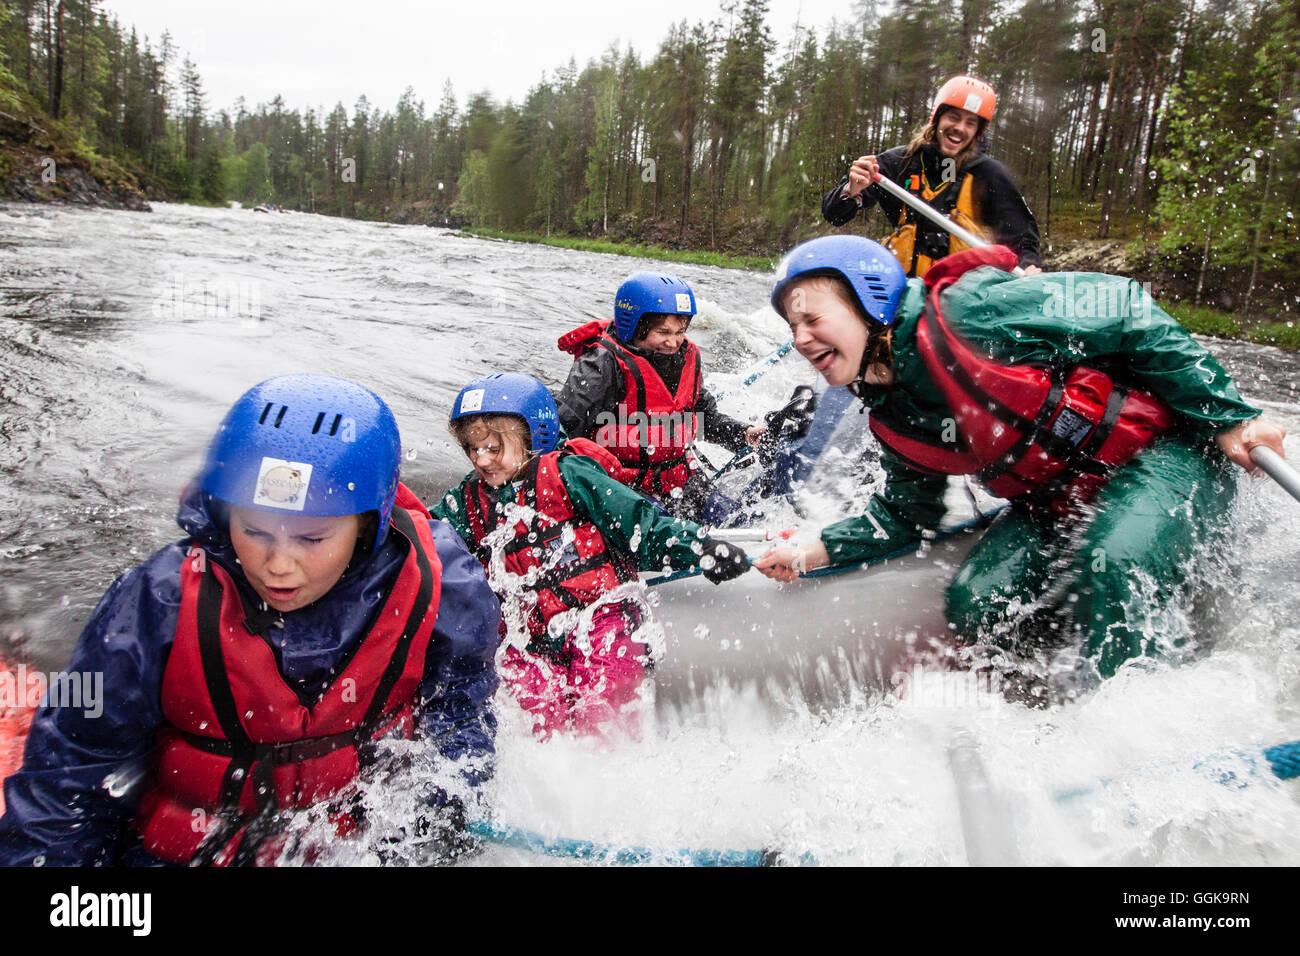 Rafting on the river Kitkajoki, Oulanka National Park, Northern Ostrobothnia, Finland - Stock Image